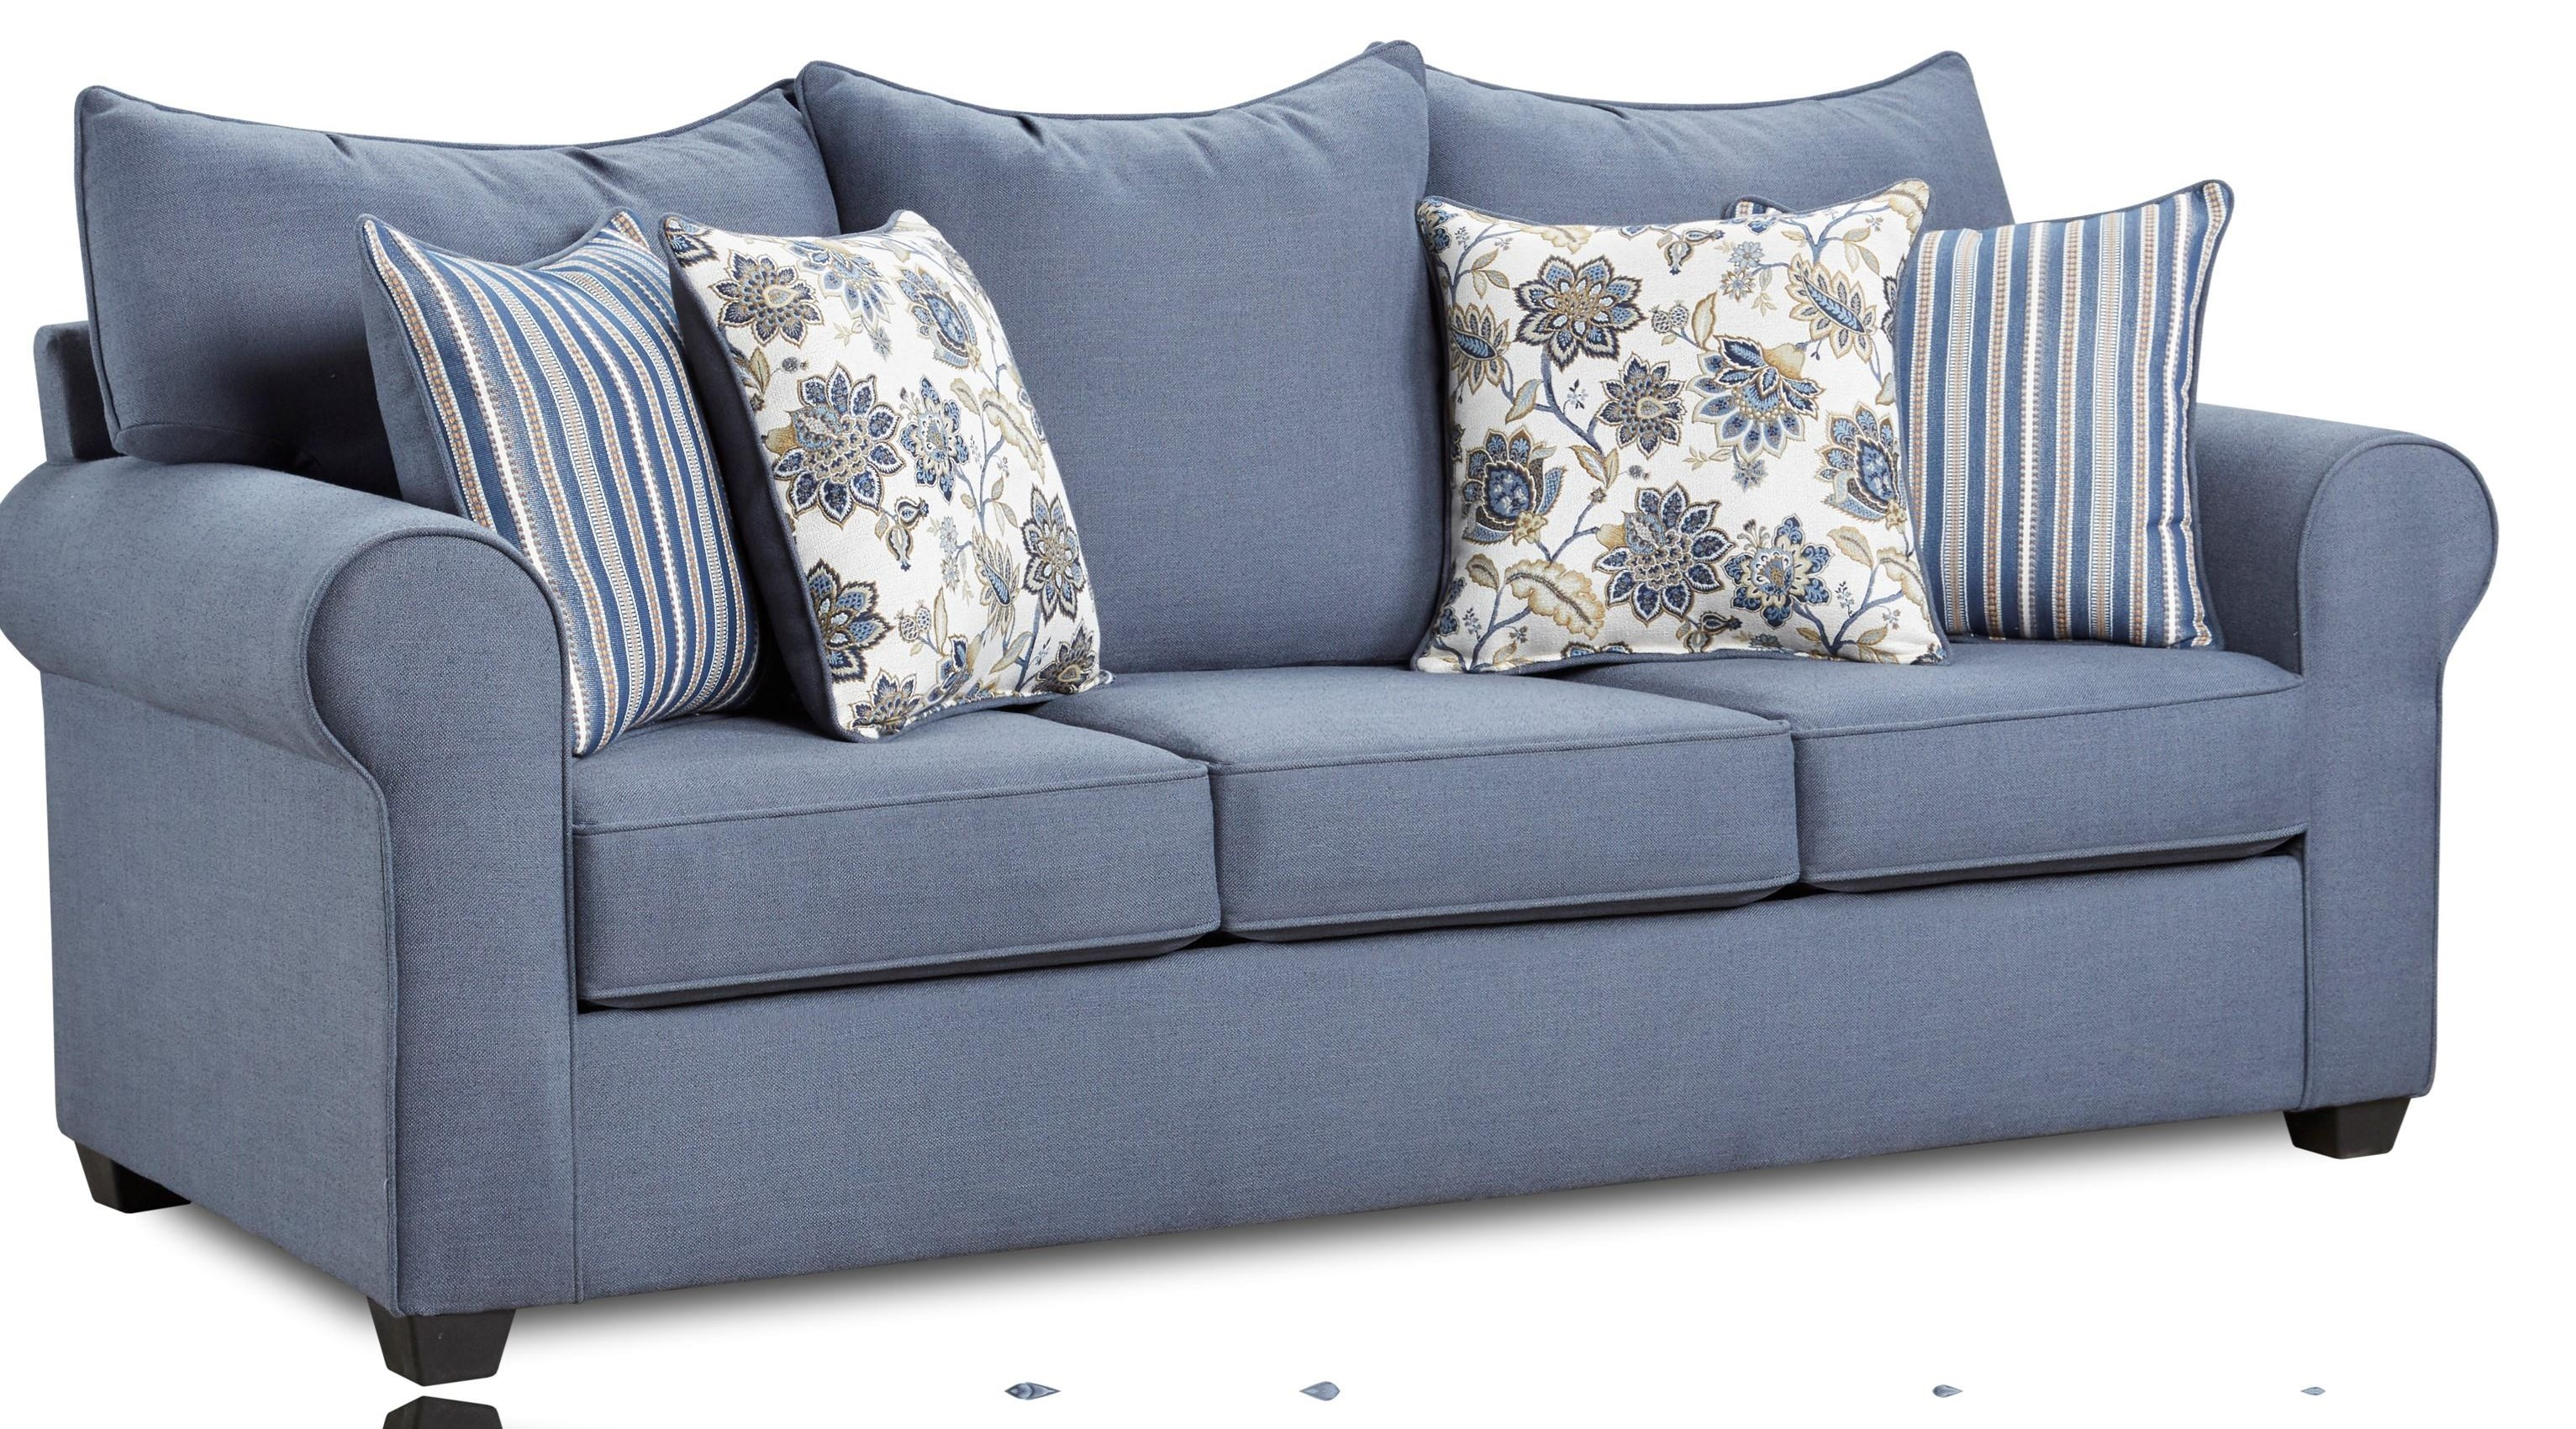 4000 Collection Indigo Blue Sofa by Washington Brothers Furniture at Furniture Fair - North Carolina